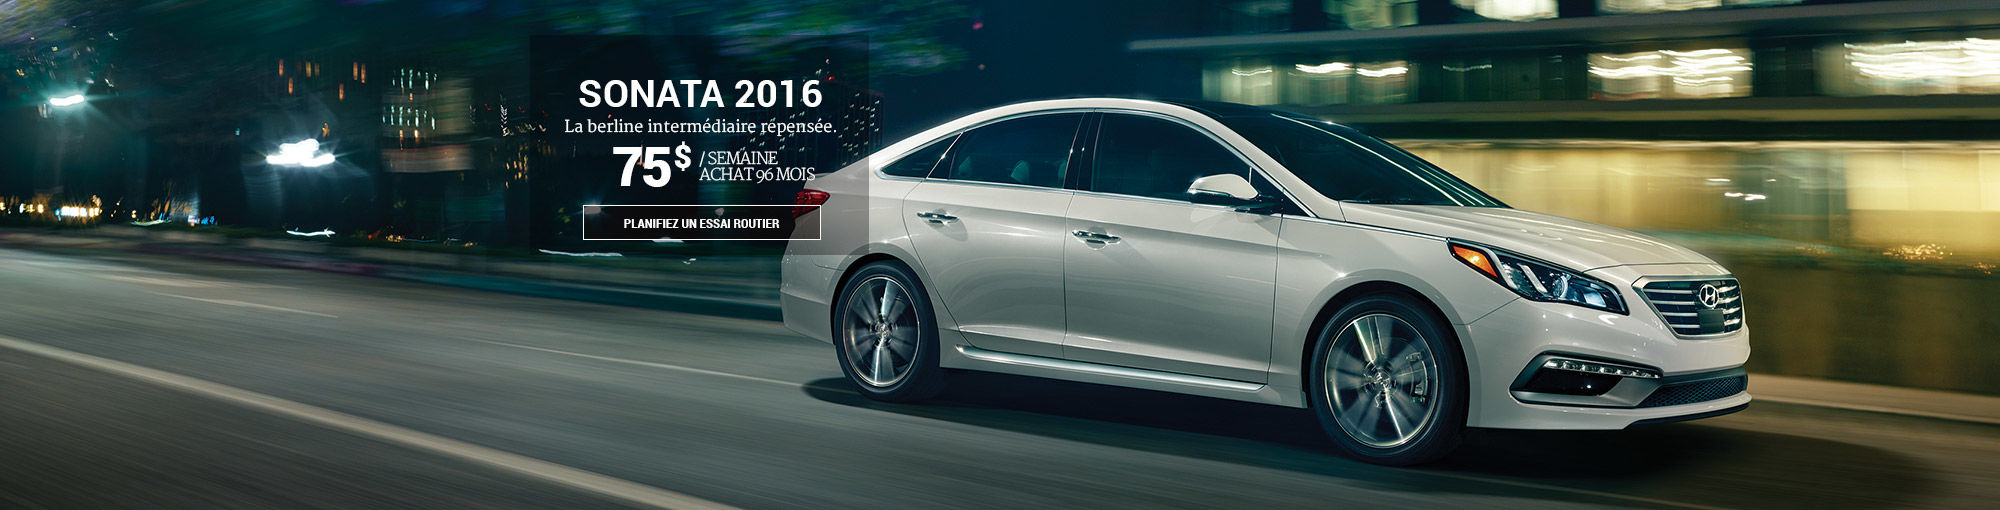 Sonata 2016 - septembre 2016 - HSH HTR